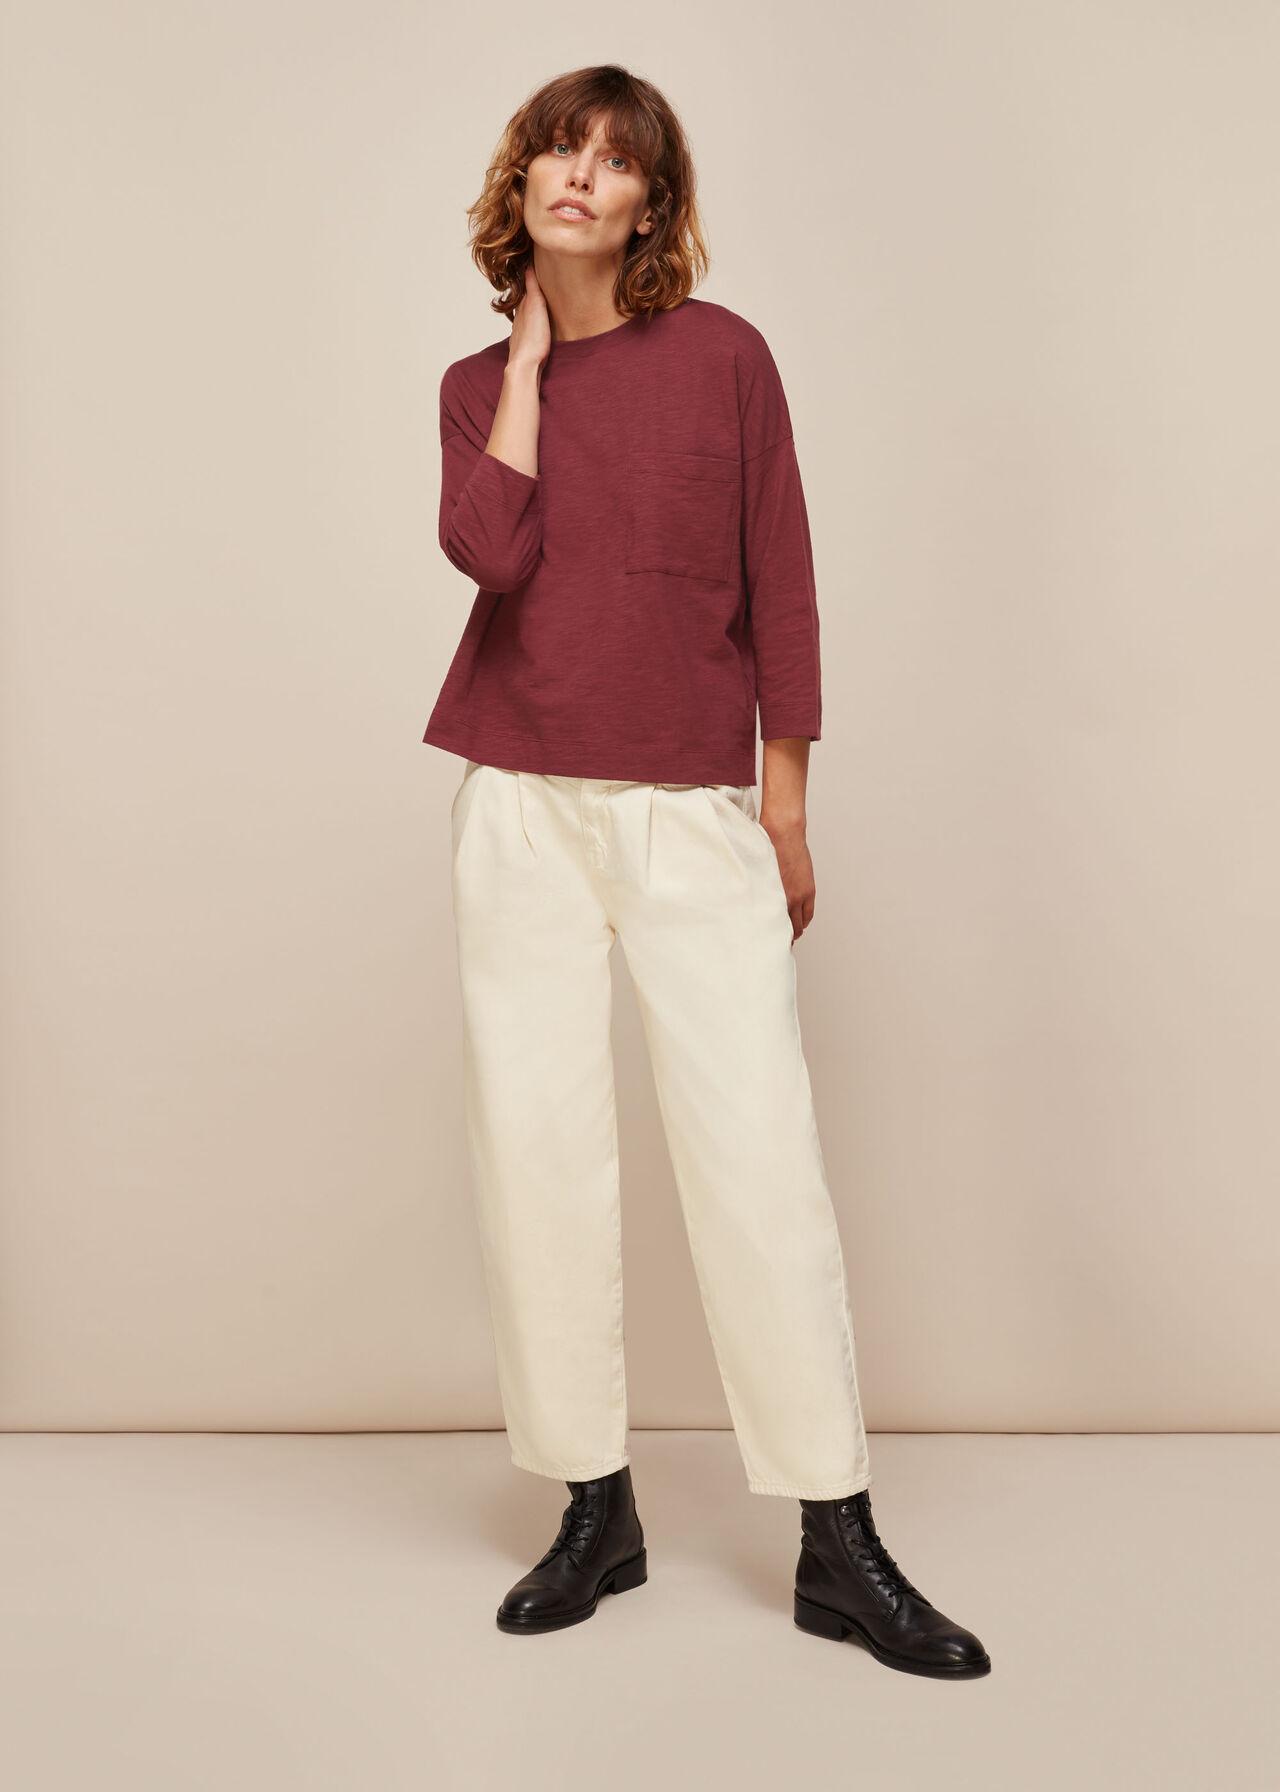 Cotton Pocket Top